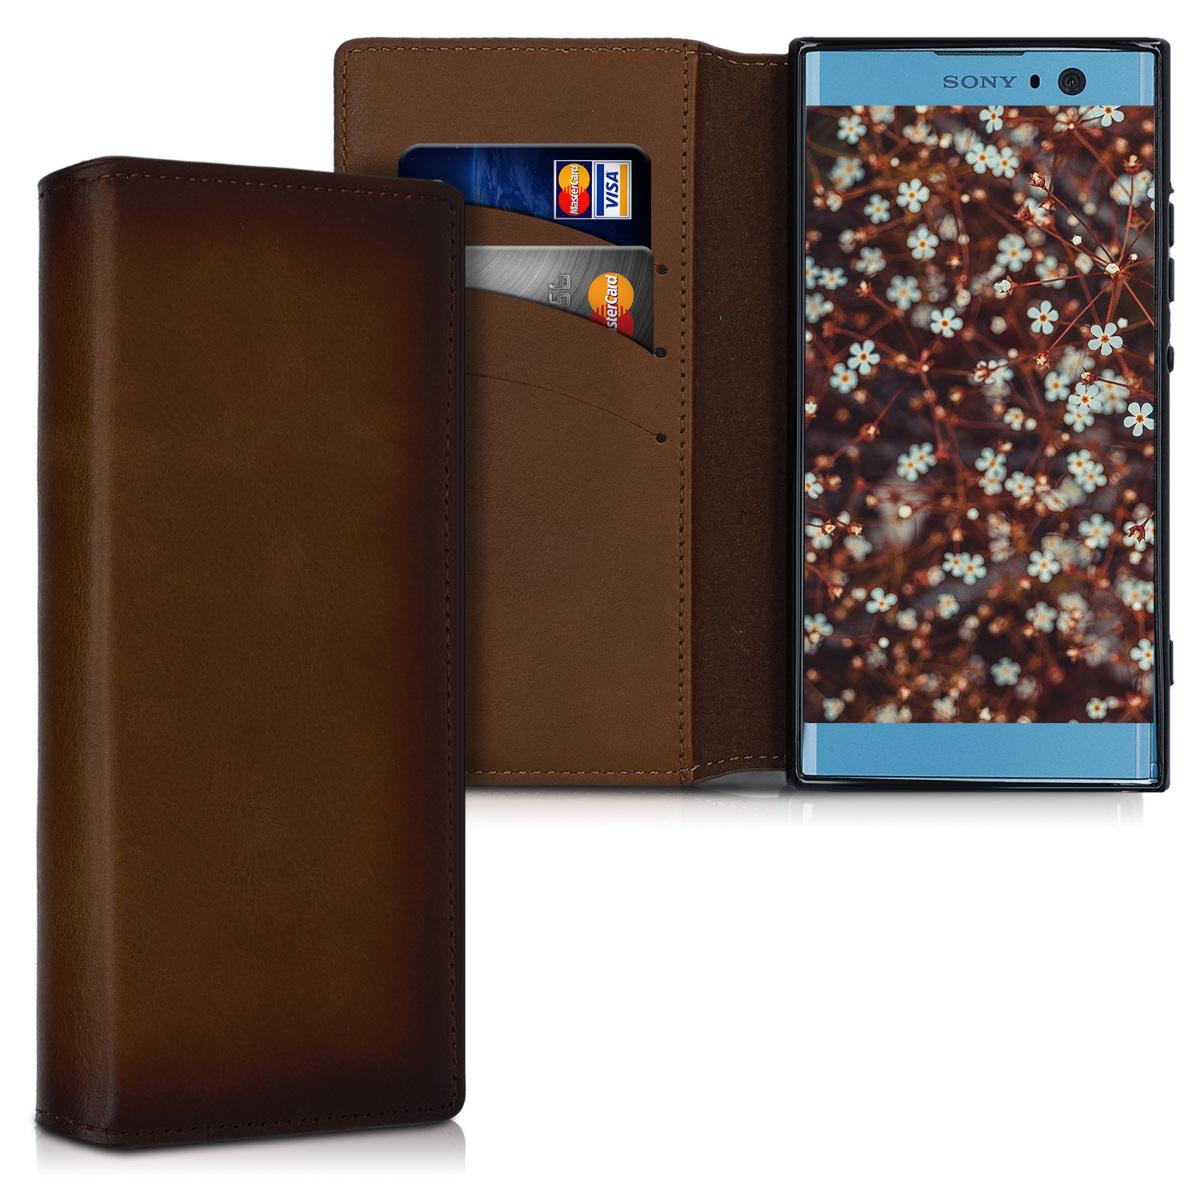 Kalibri Δερμάτινη Suede Θήκη - Πορτοφόλι Sony Xperia XA2 - Vintage Brown (47142.133)